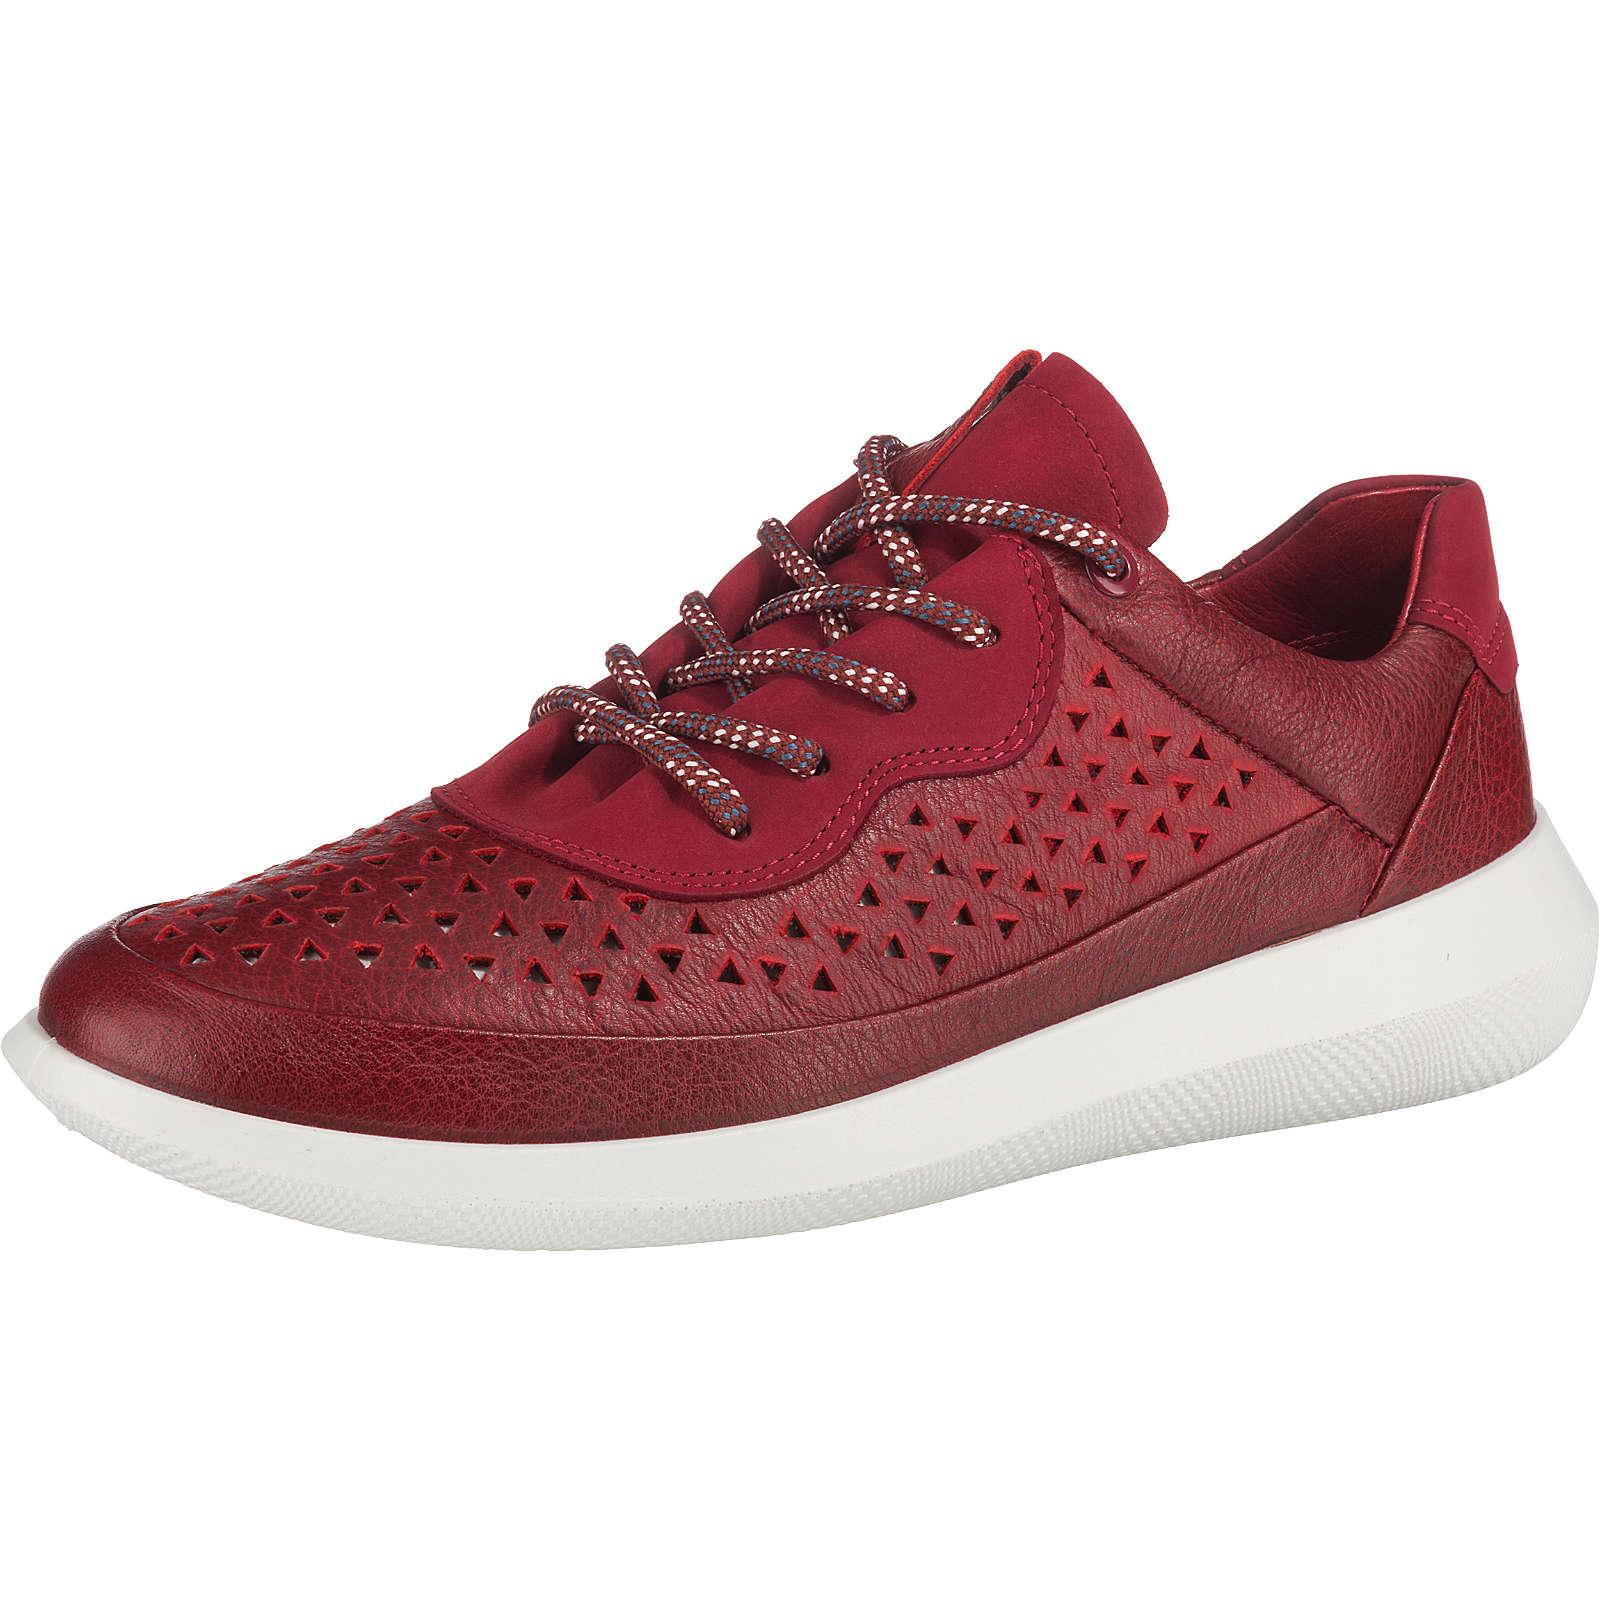 ECCO SCINAPSE Sneakers Low rot Damen Gr. 39